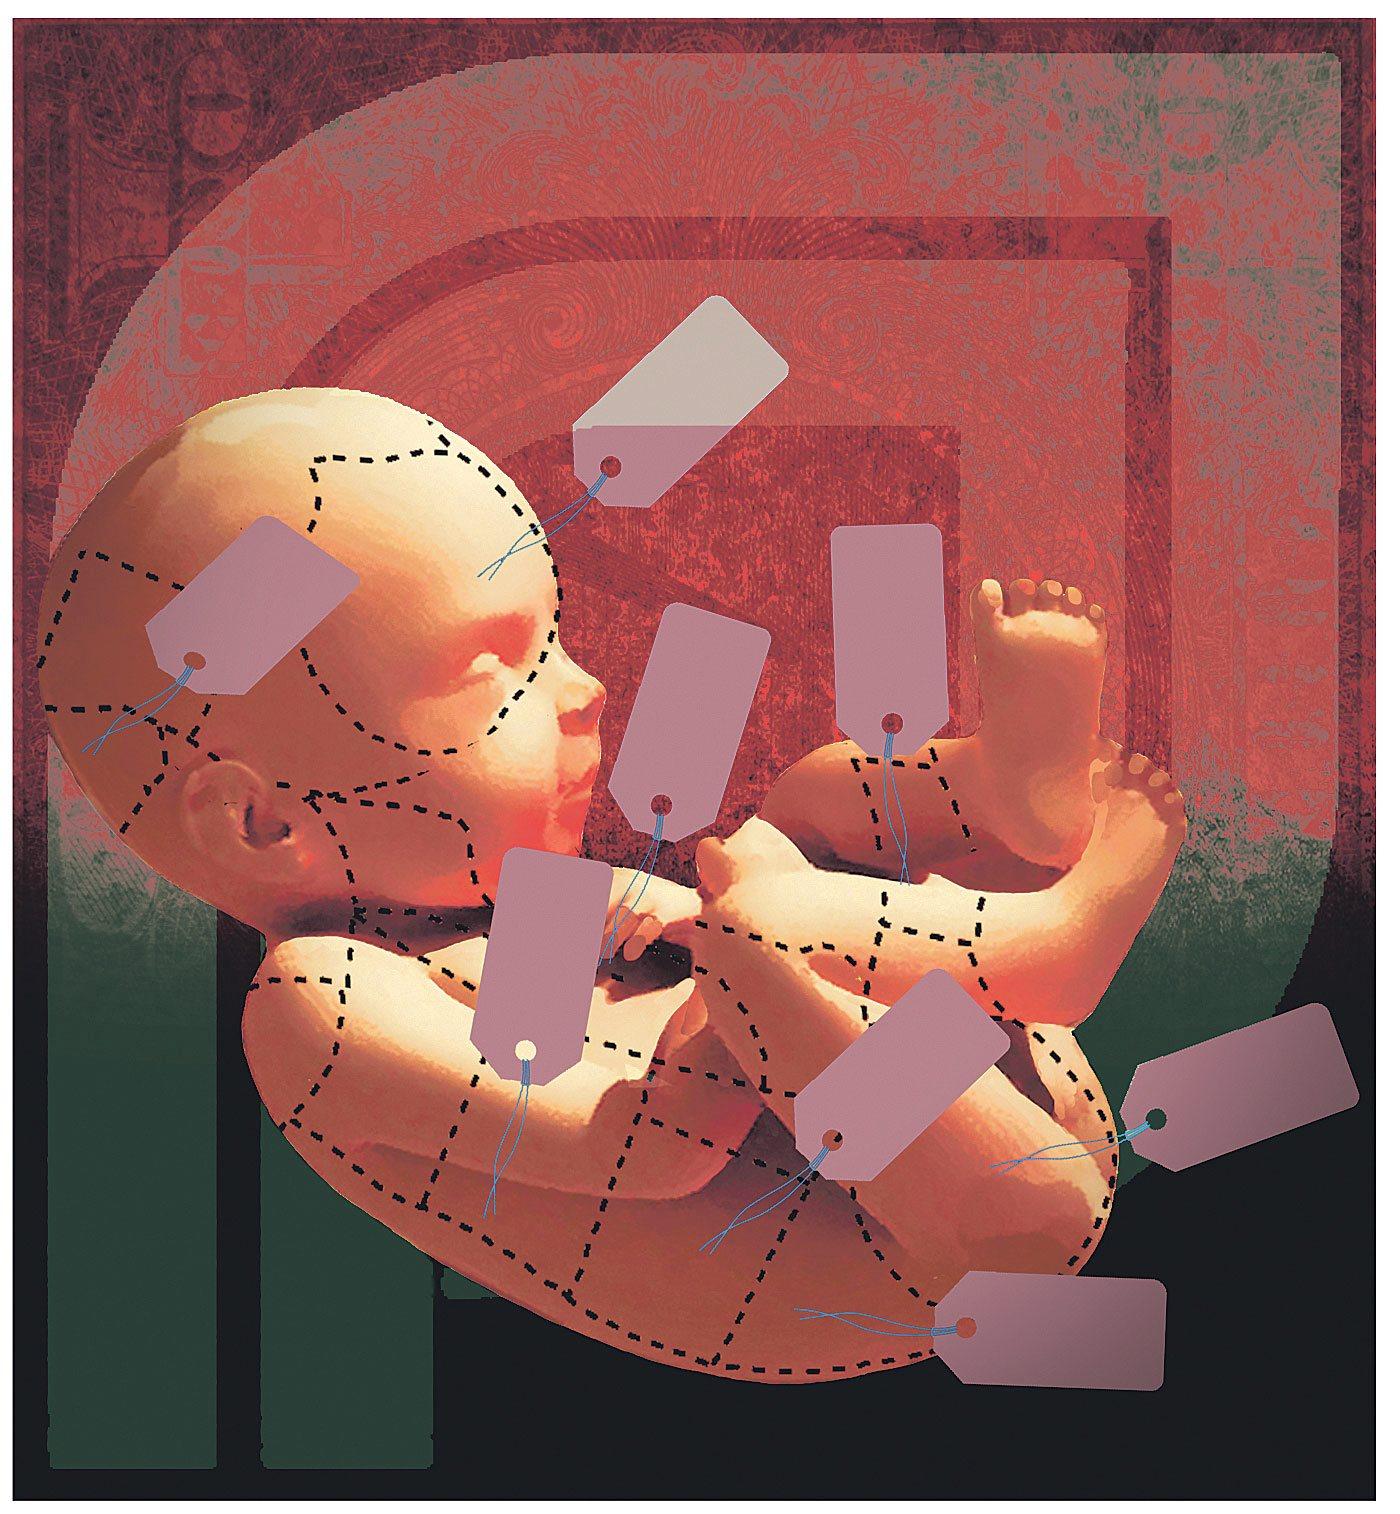 August 2015 – Planned Parenthood Comprehensive Health Center Overland Park Ks